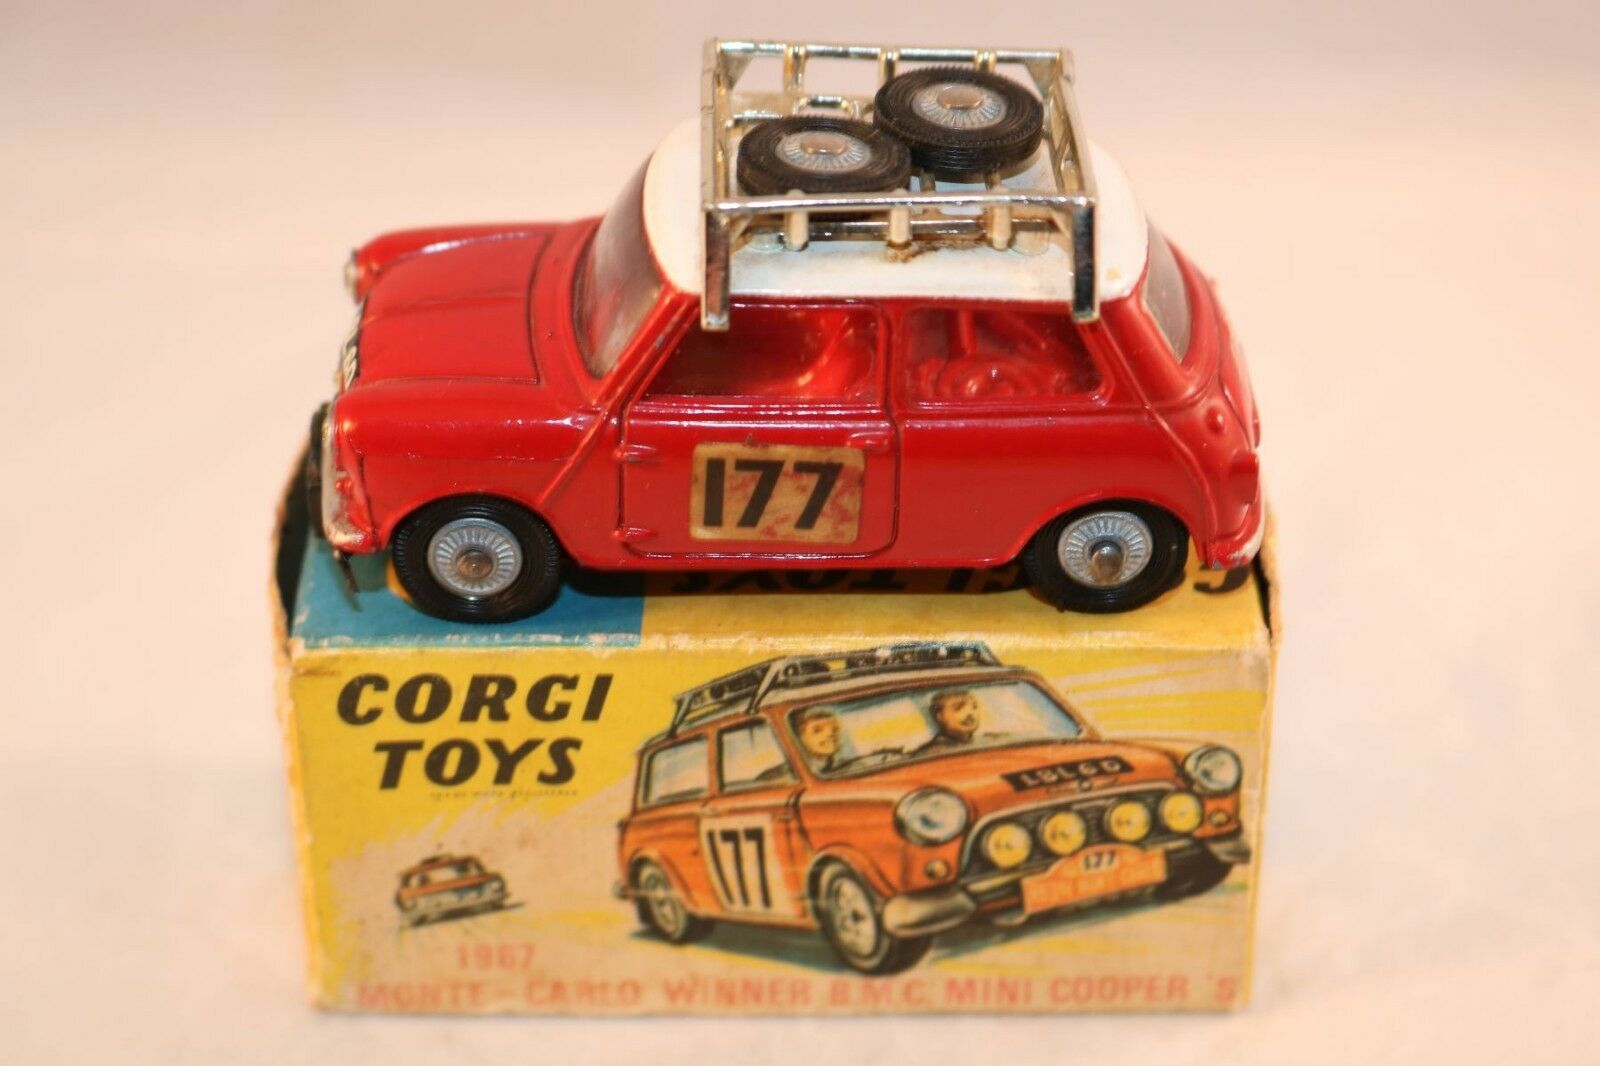 Corgi Toys 339 B.M.C. Mini Cooper S Monte-Carlo winner near mint in box